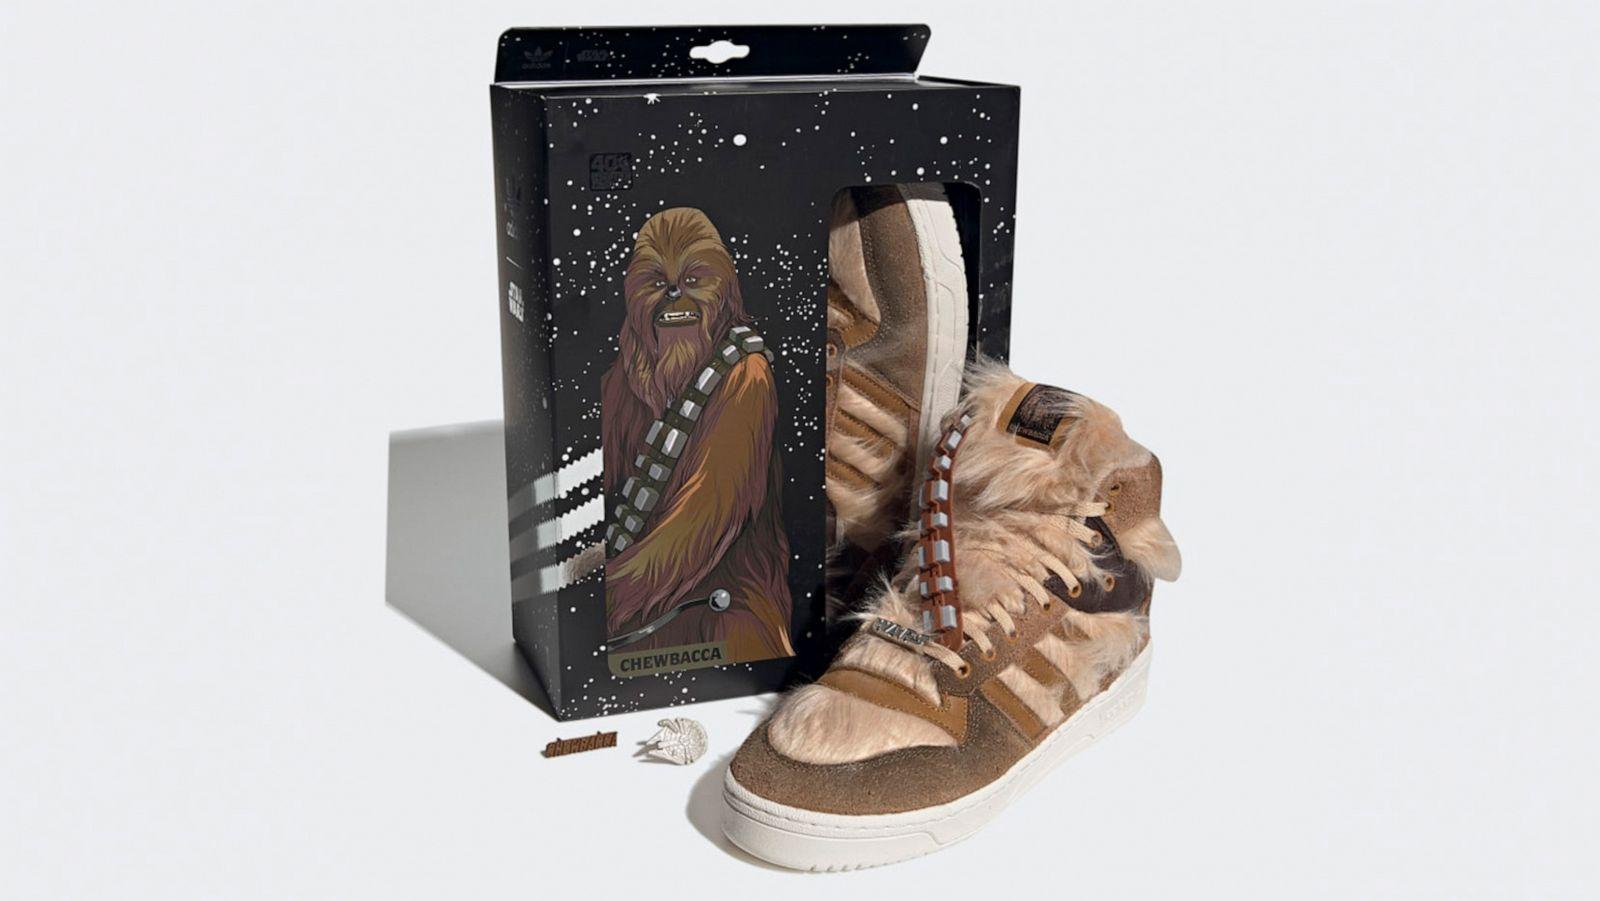 Adidas launches 'Star Wars' Boba Fett